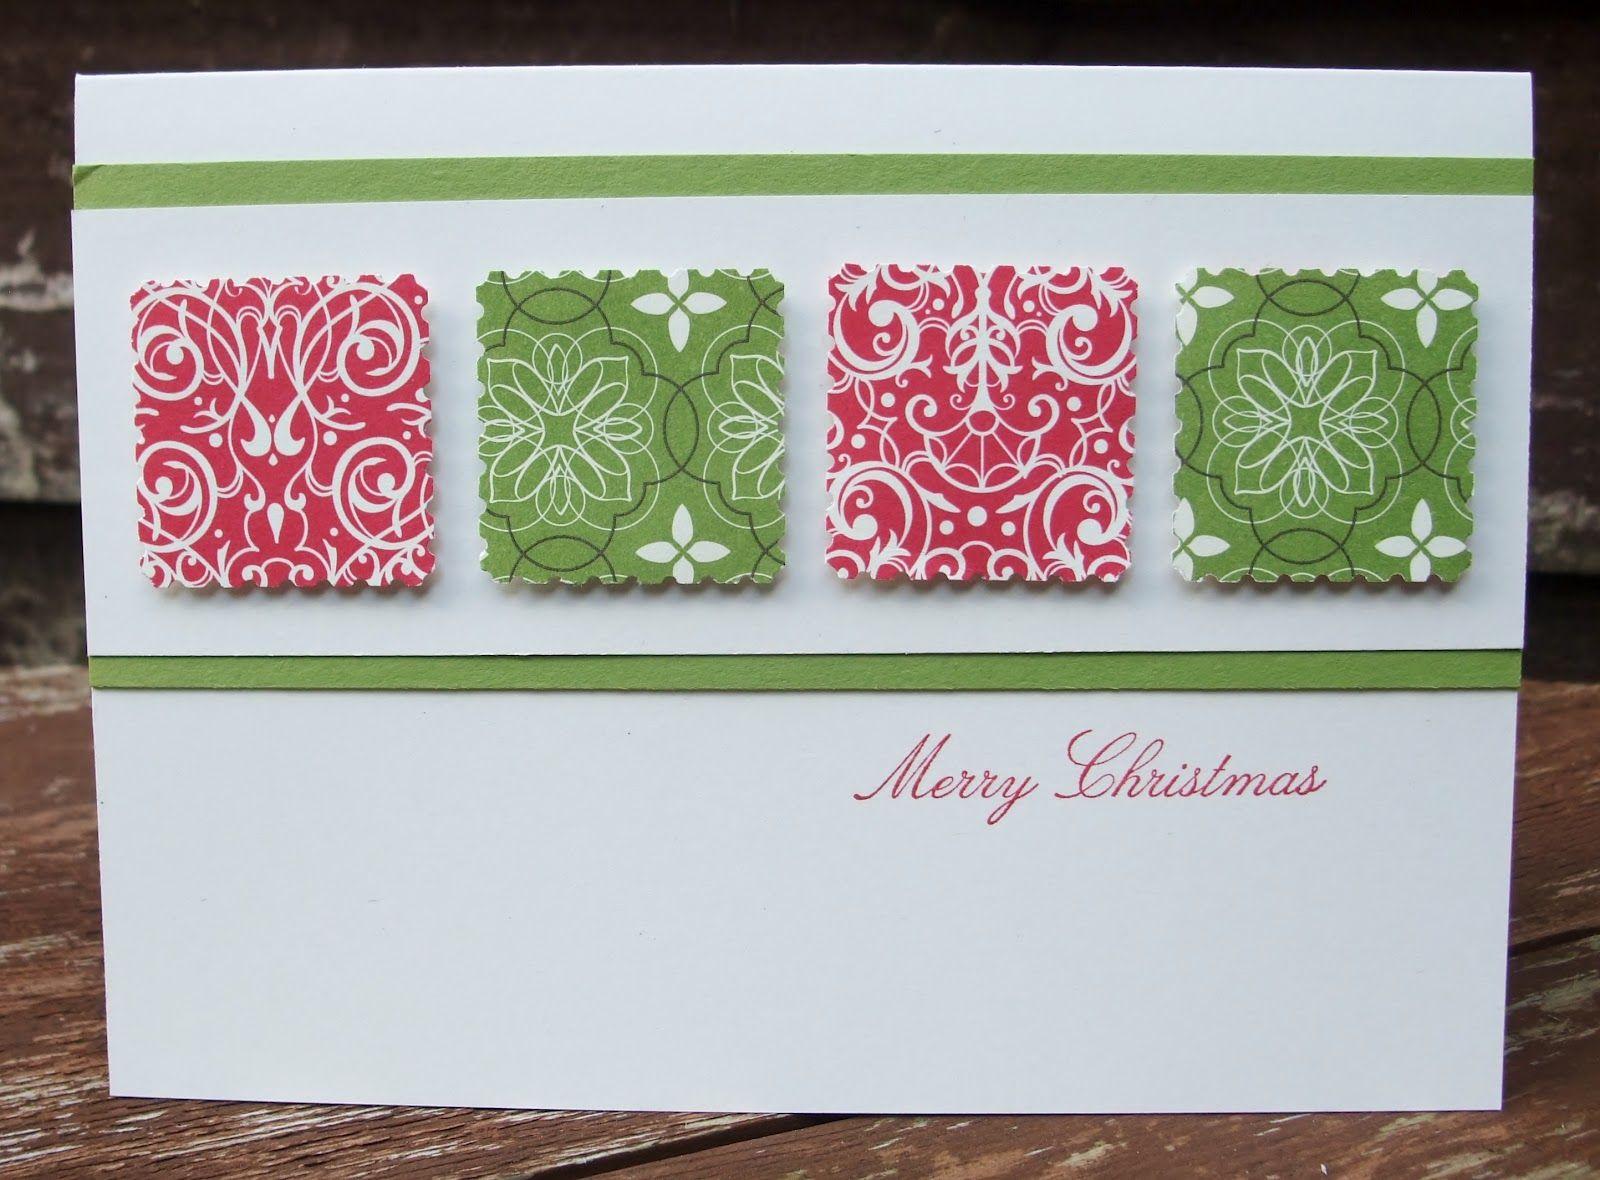 christmas cards homemade designs - Google Search | Christmas cards ...